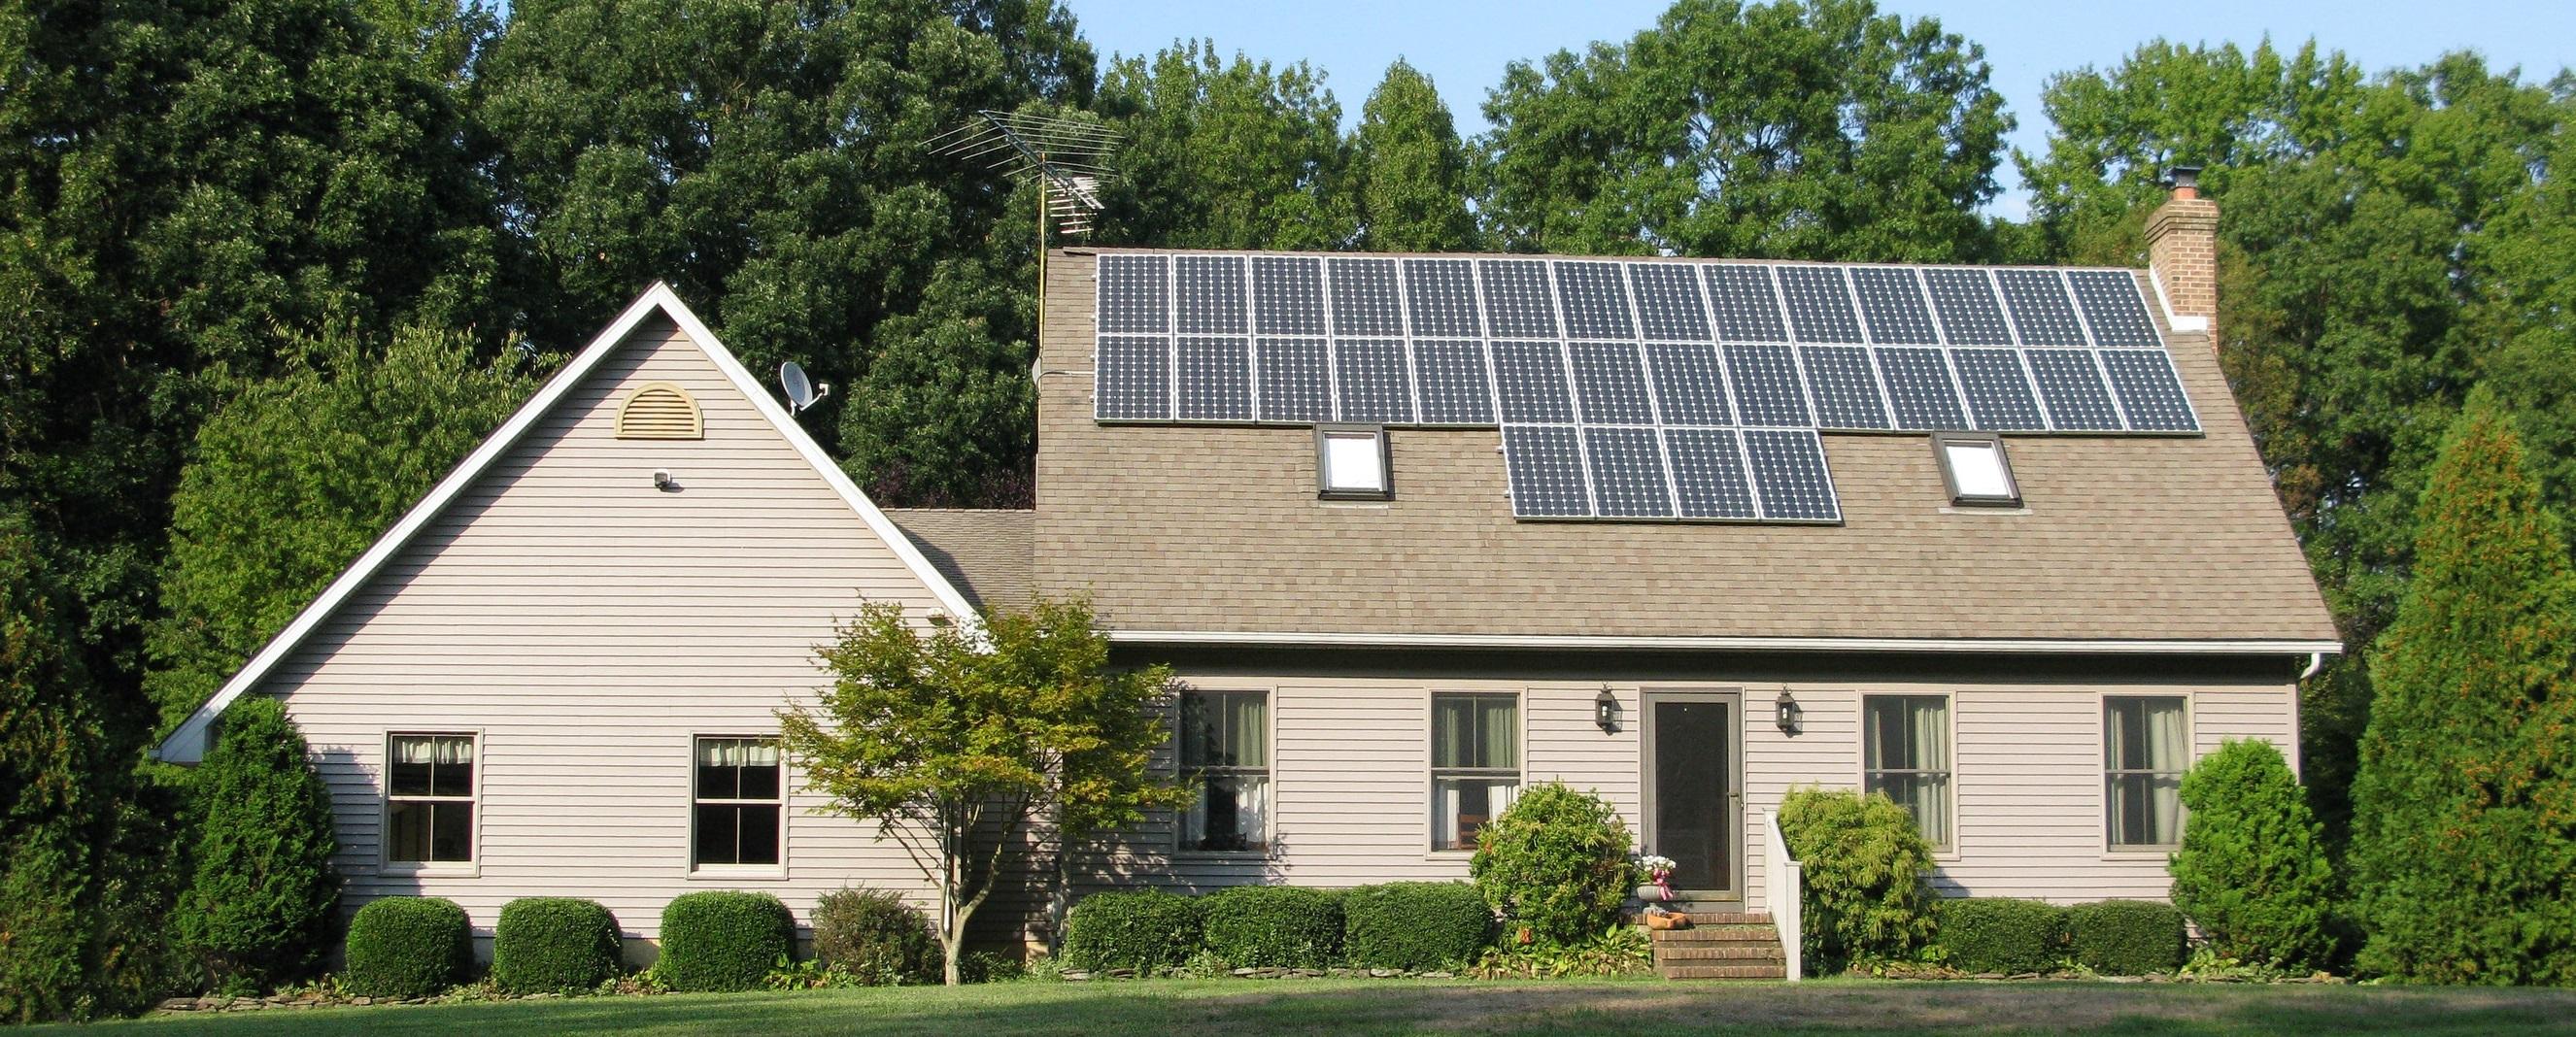 Solar Power Energy Companies, Home Solar Panel Installation